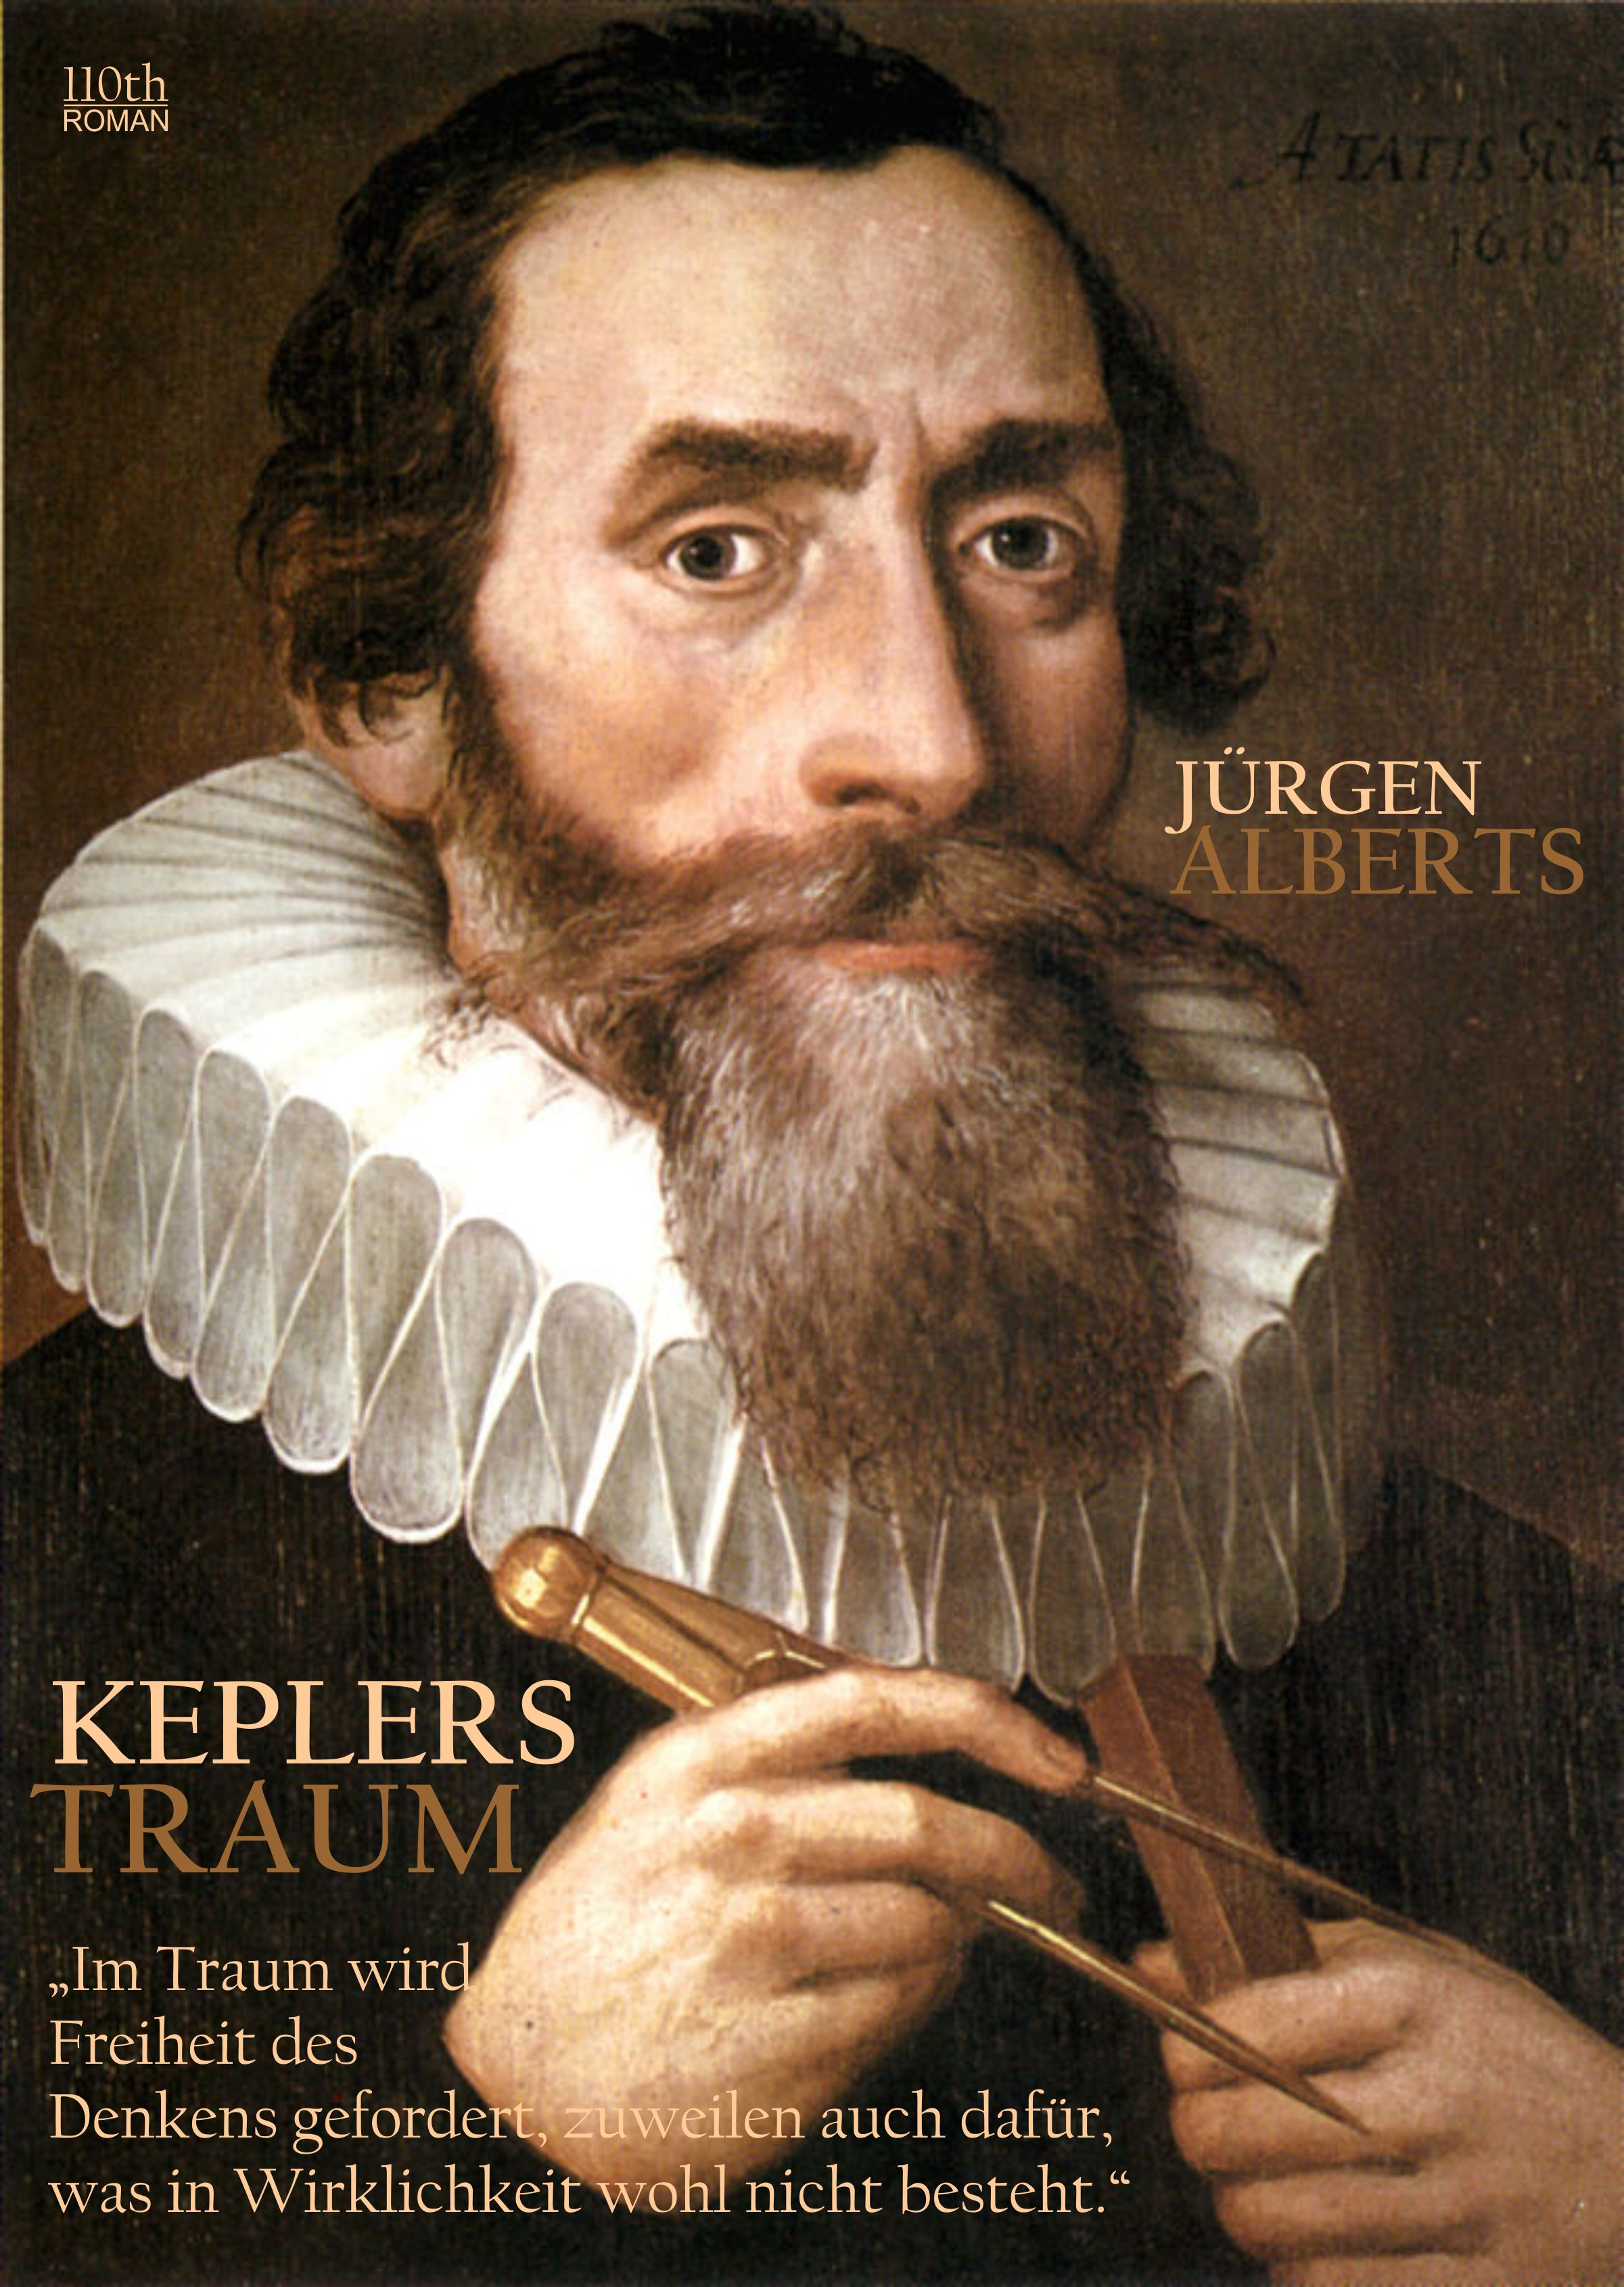 Jurgen Alberts Keplers Traum